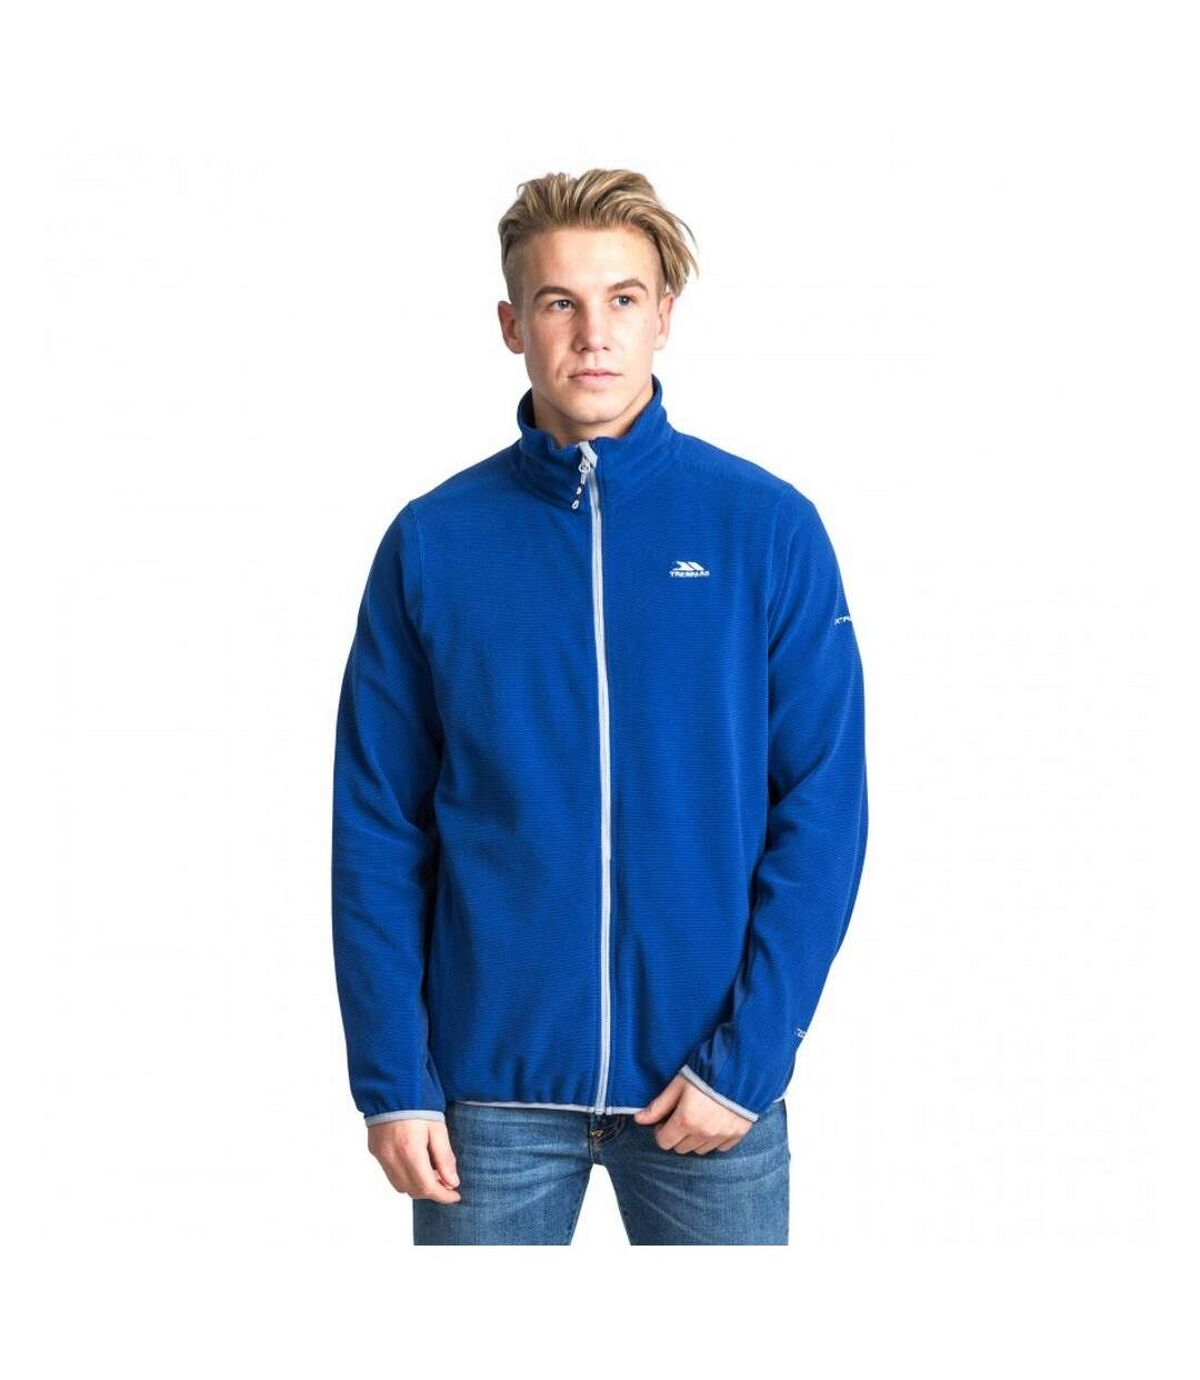 Trespass - Polaire zippée MIRTH - Homme (Bleu roi côtelé) - UTTP4146